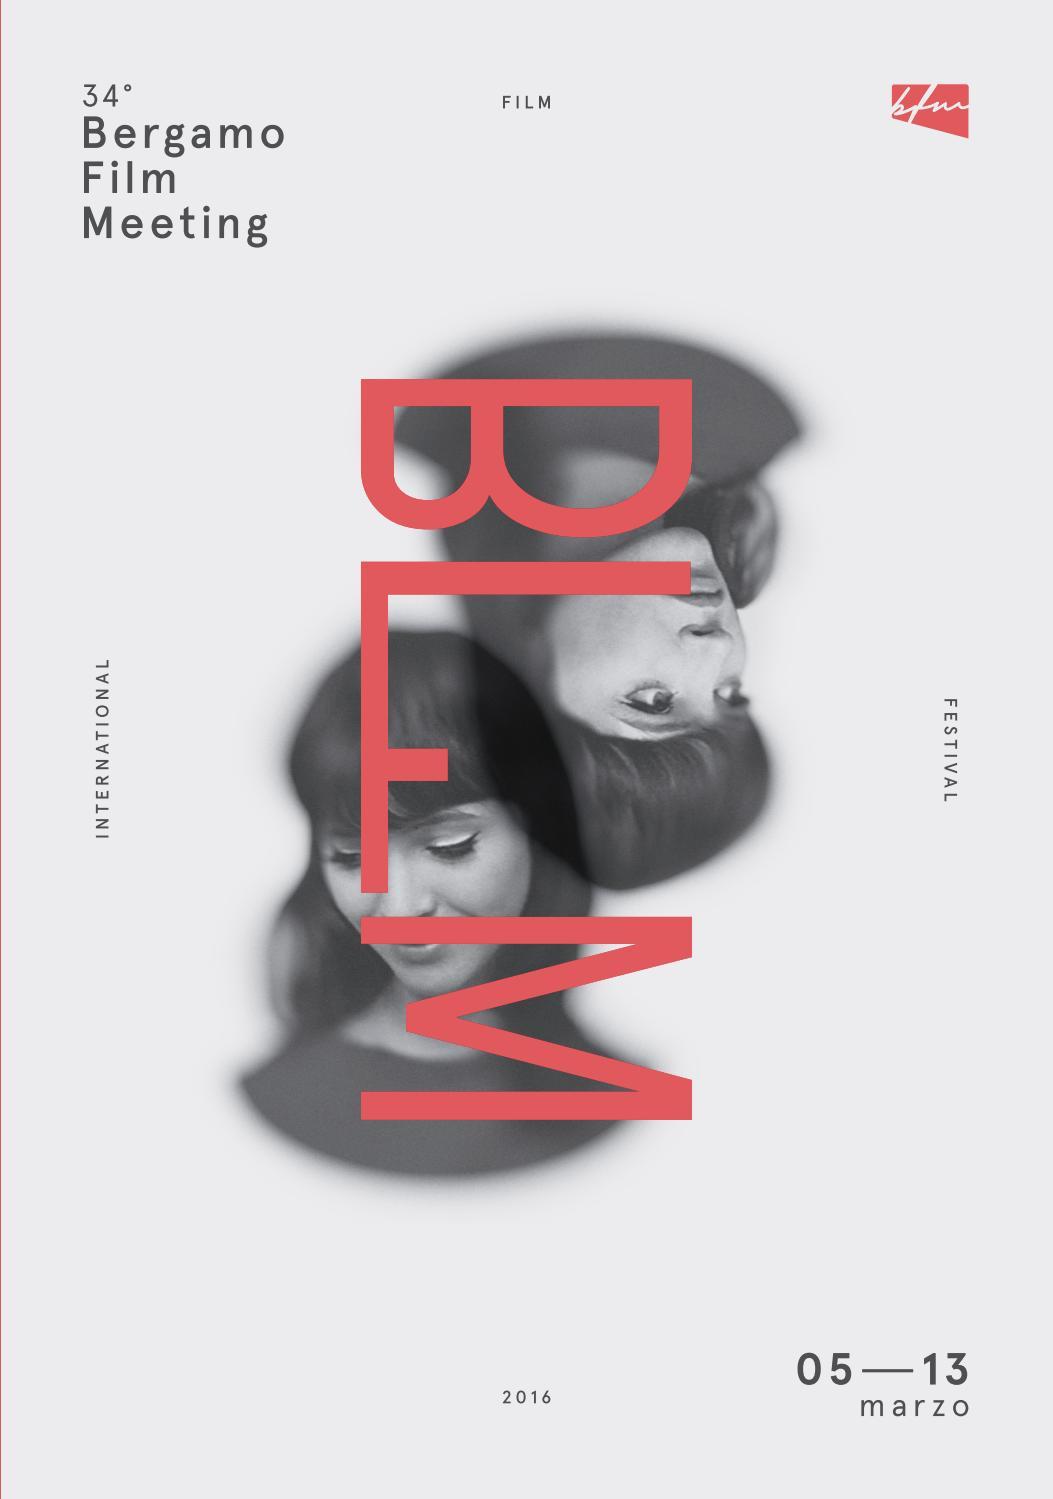 Bergamo Film Meeting Catalogo 2016 by aficfestival issuu